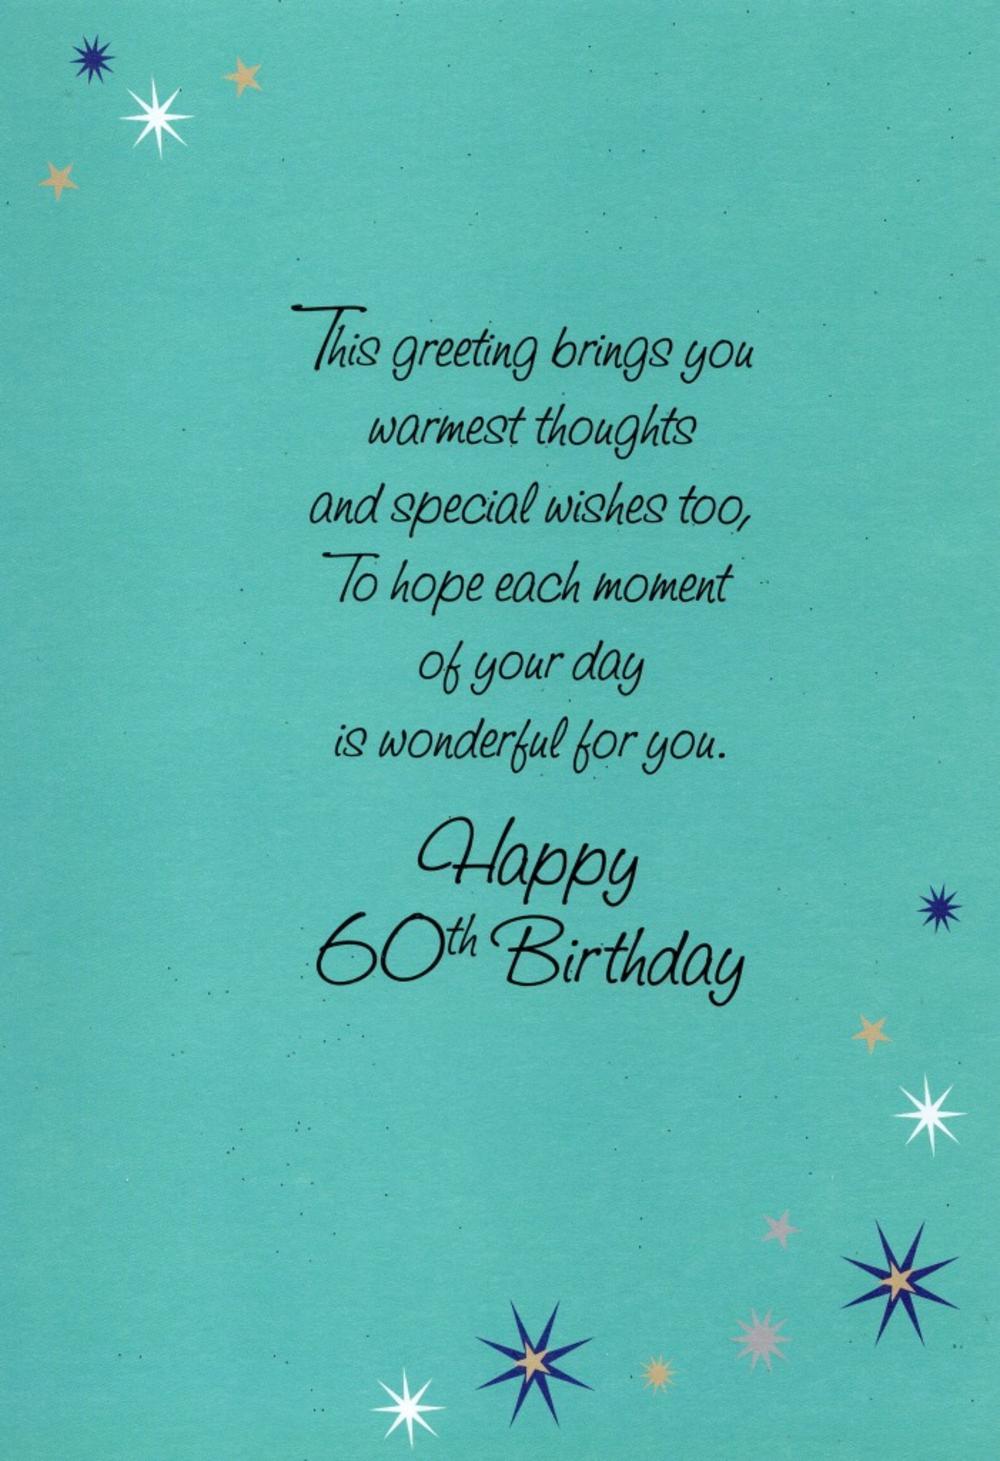 Happy 60th birthday greeting card cards love kates happy 60th birthday greeting card thumbnail 1 thumbnail 2 m4hsunfo